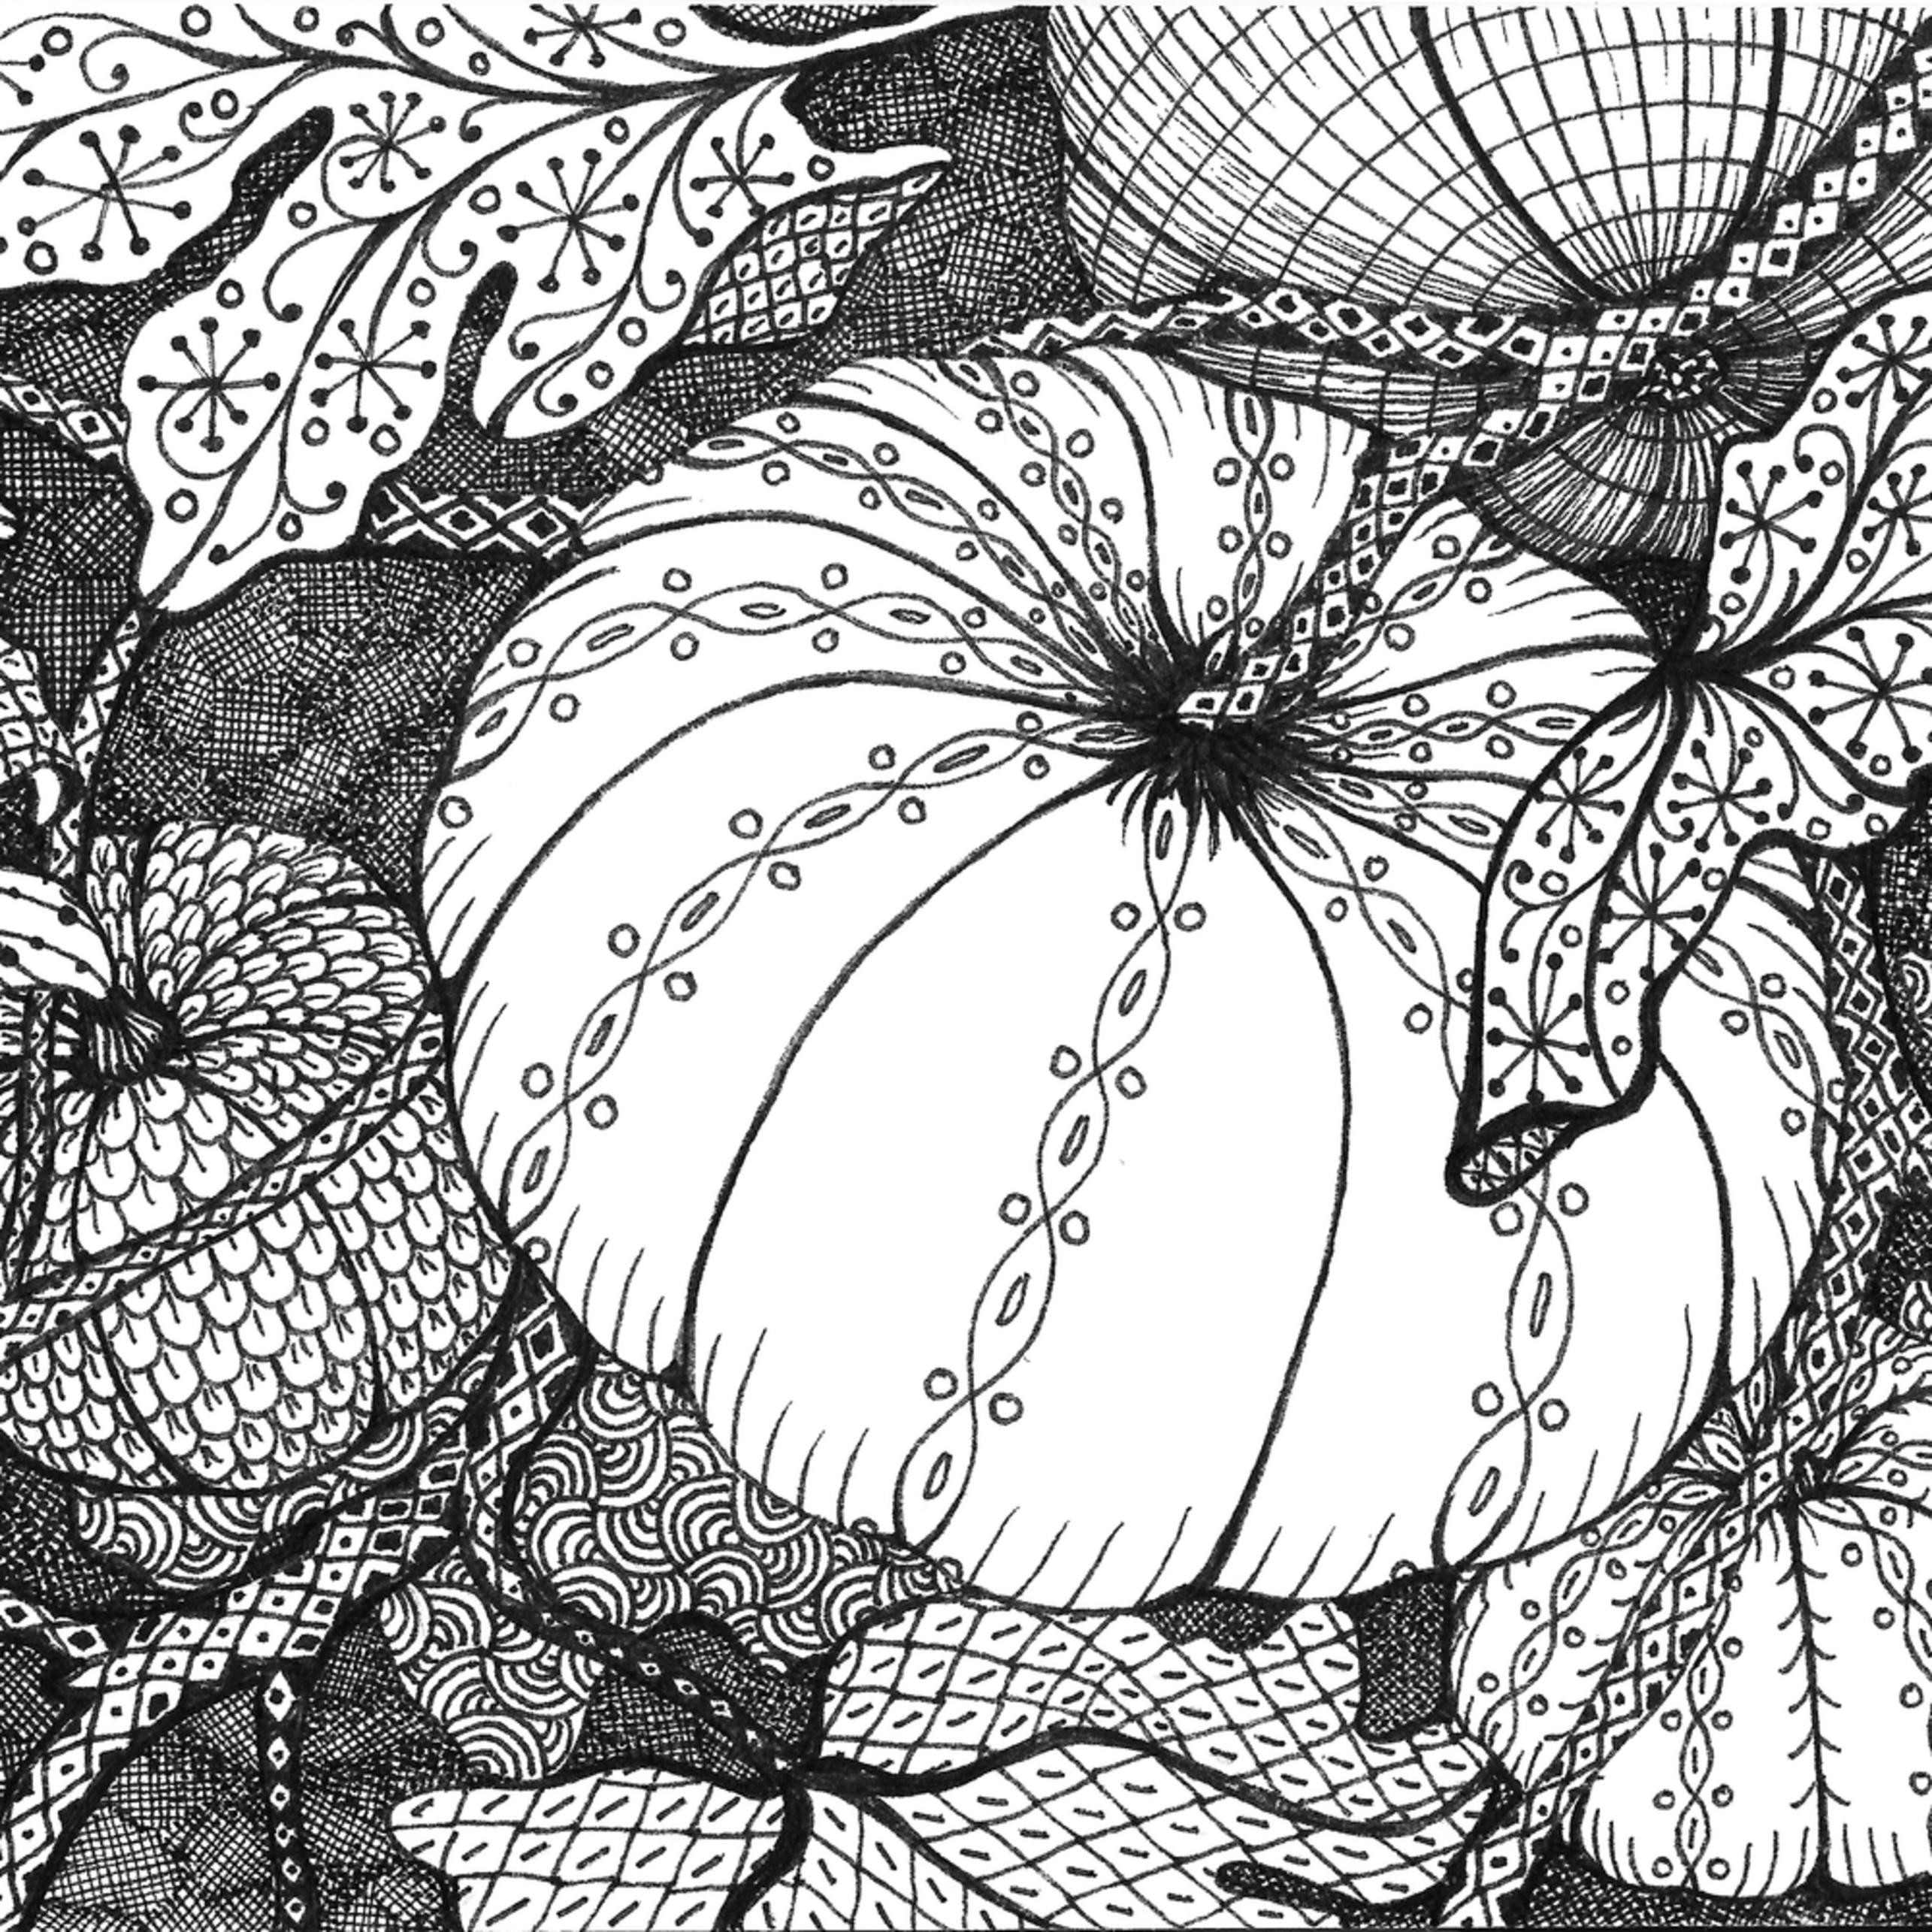 Pumpkin 2 august b2di2g